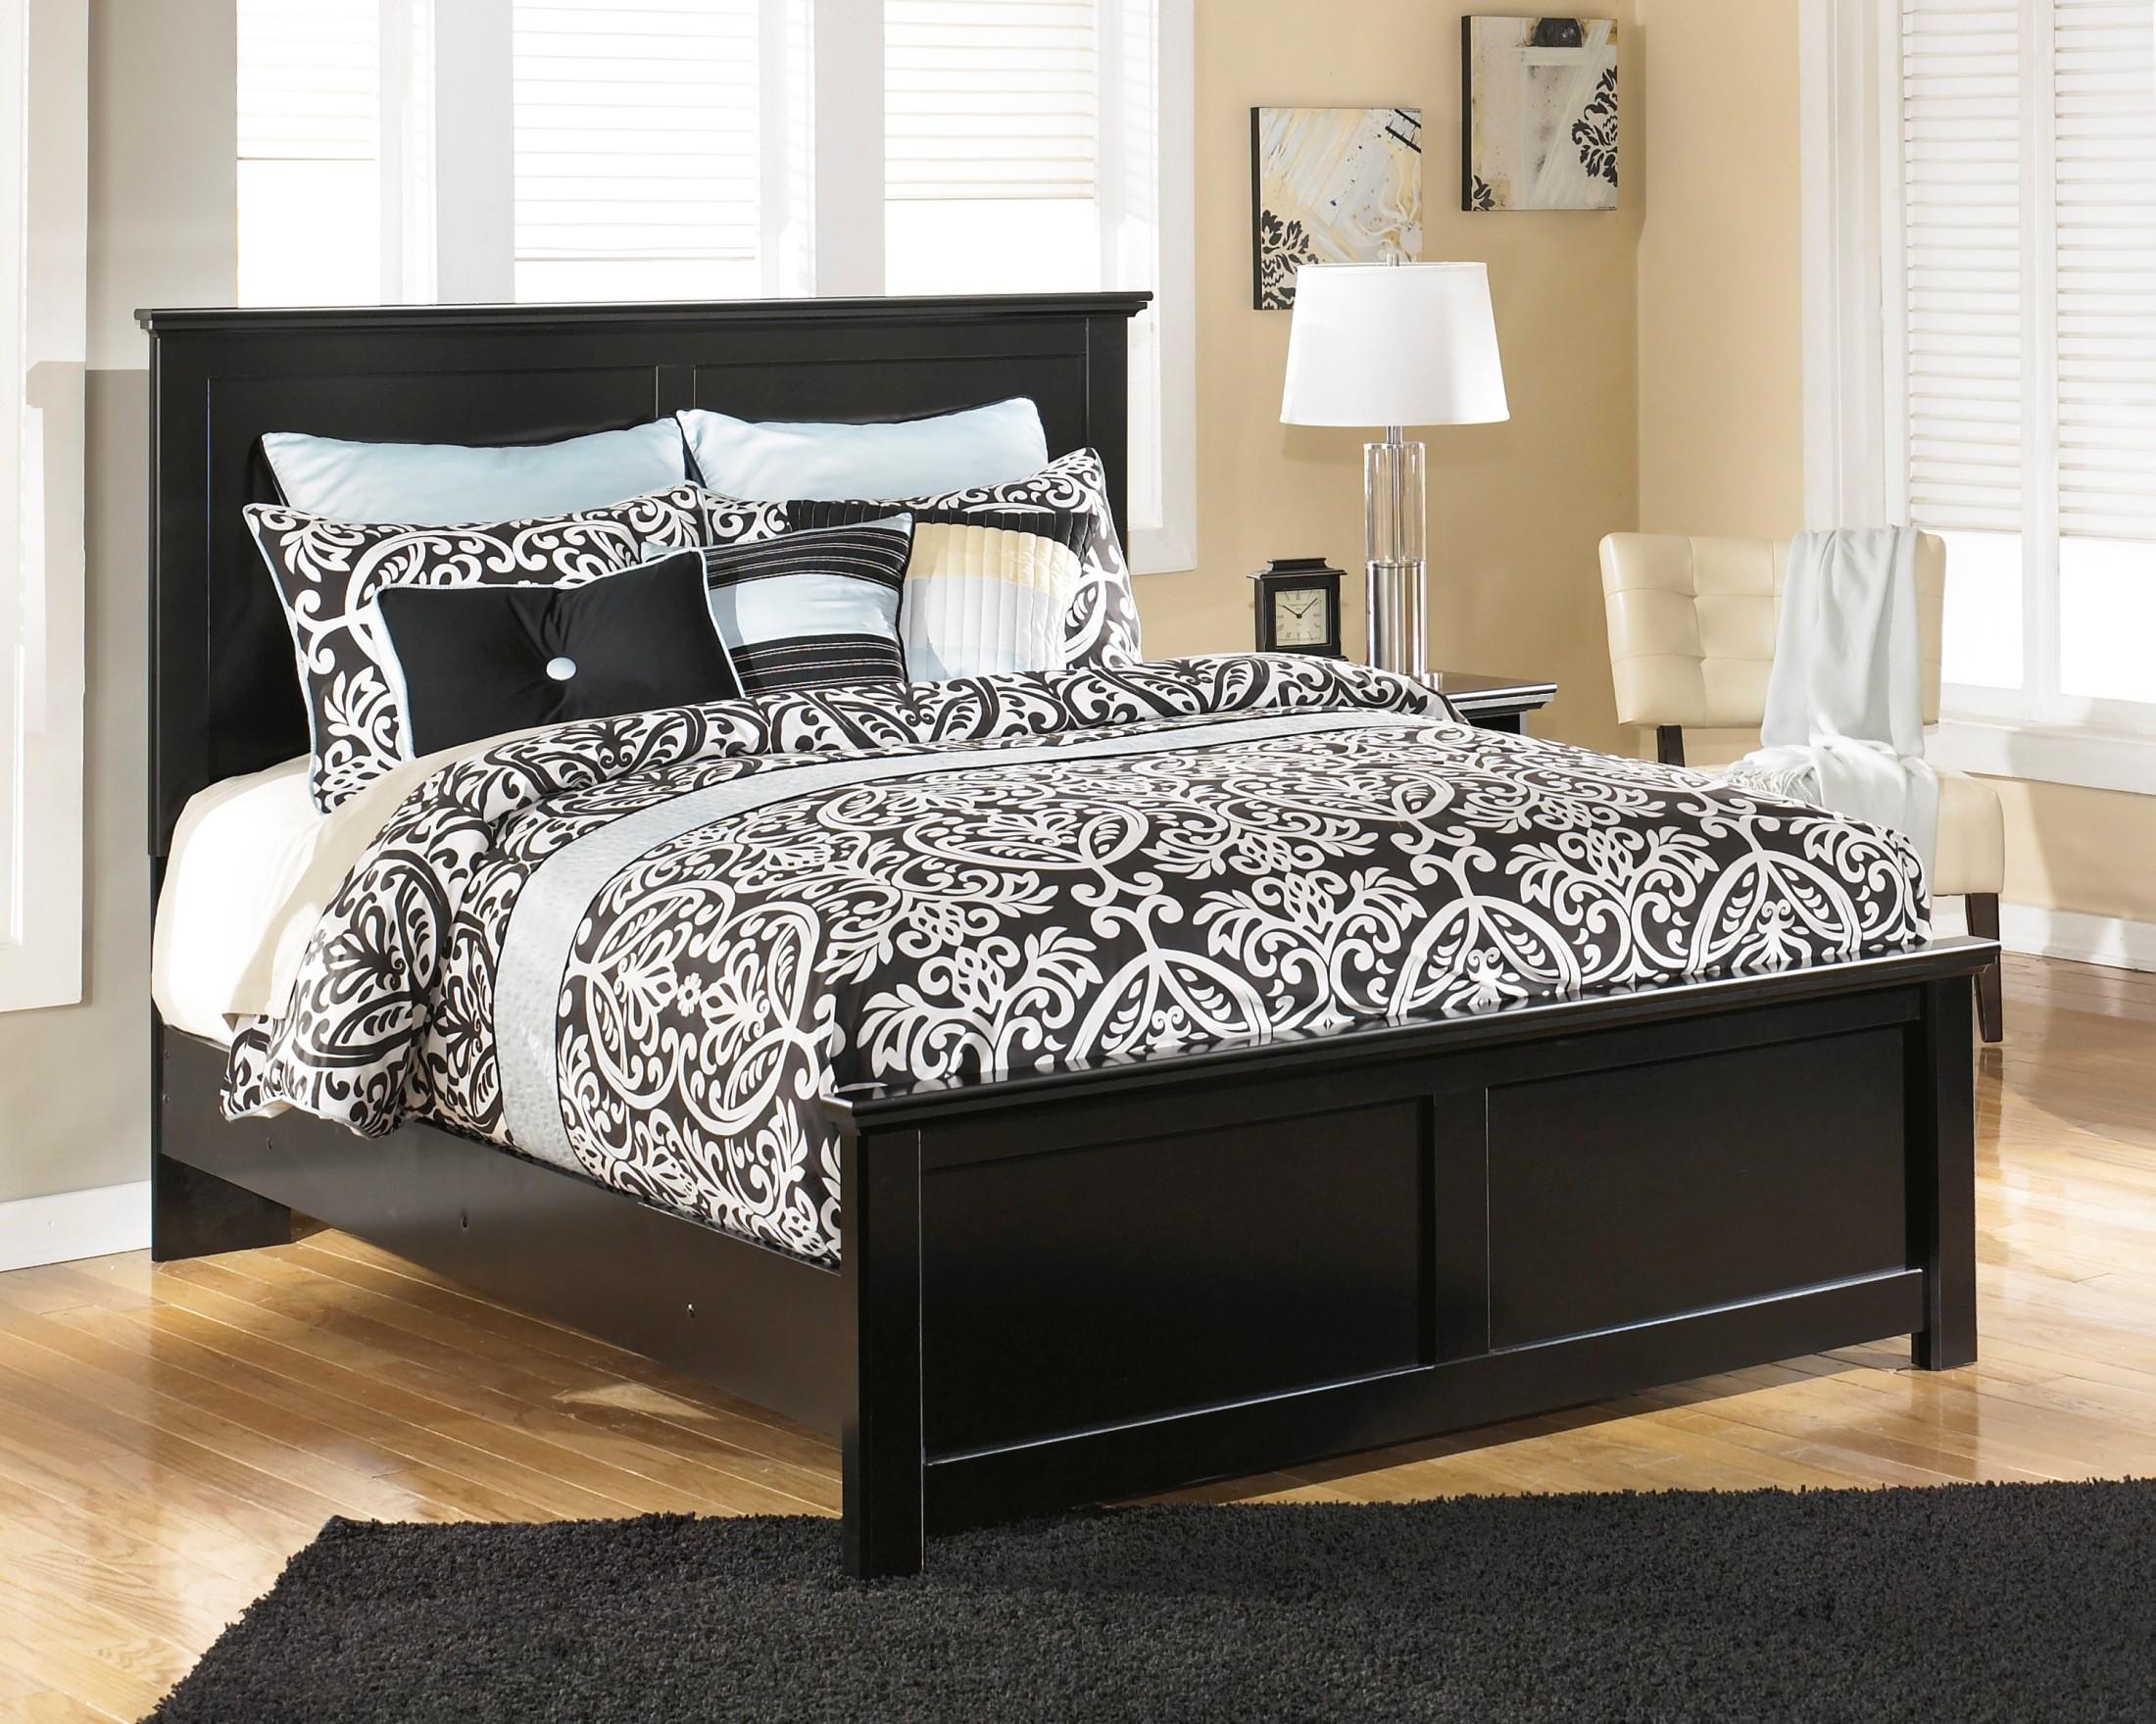 Maribel Queen Panel Bed From Ashley B138 57 54 96 Coleman Furniture